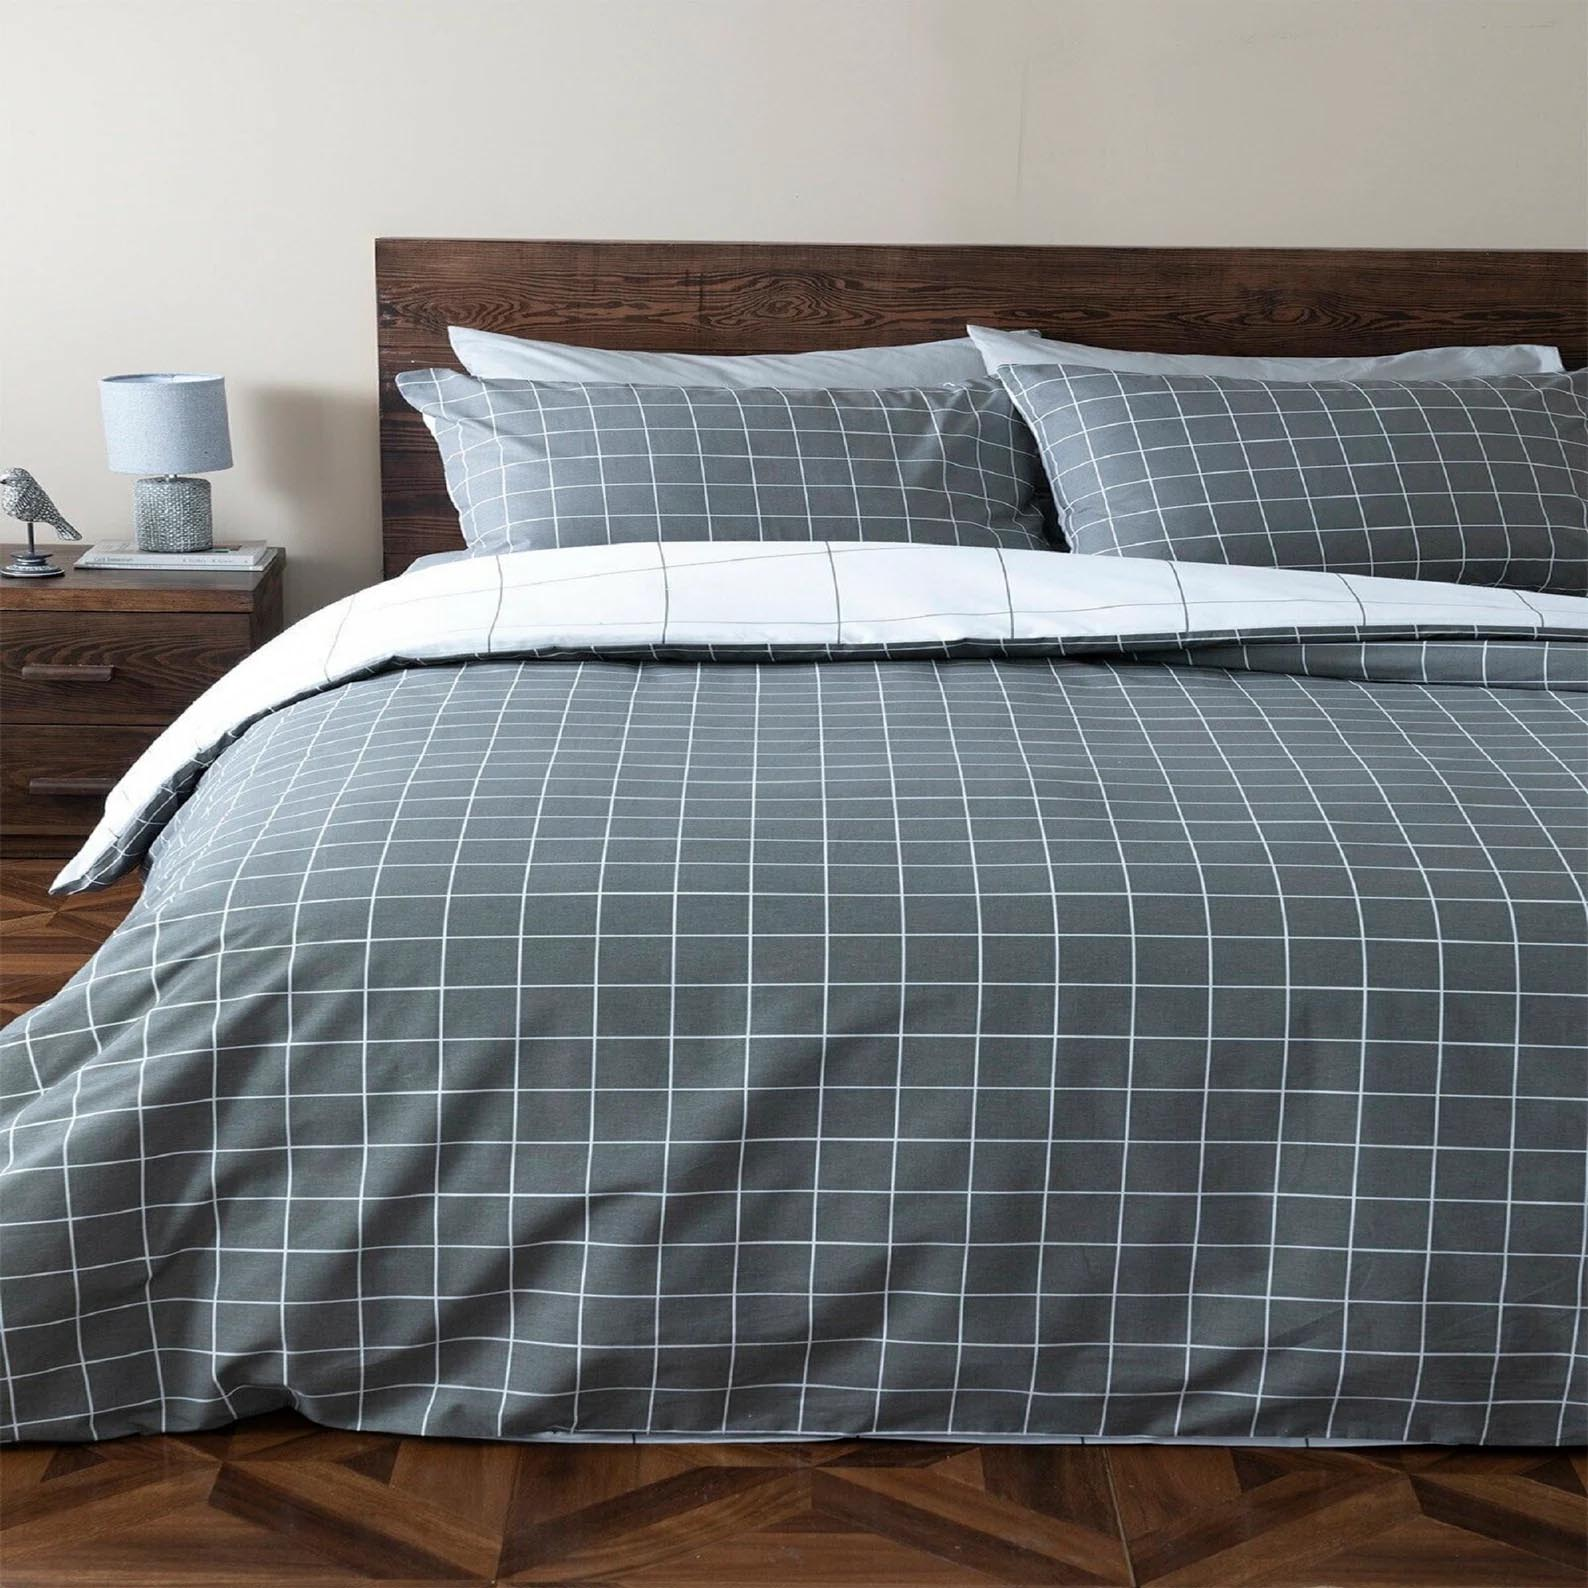 Modern Bedroom Decor - Grey and white geometric bedding.